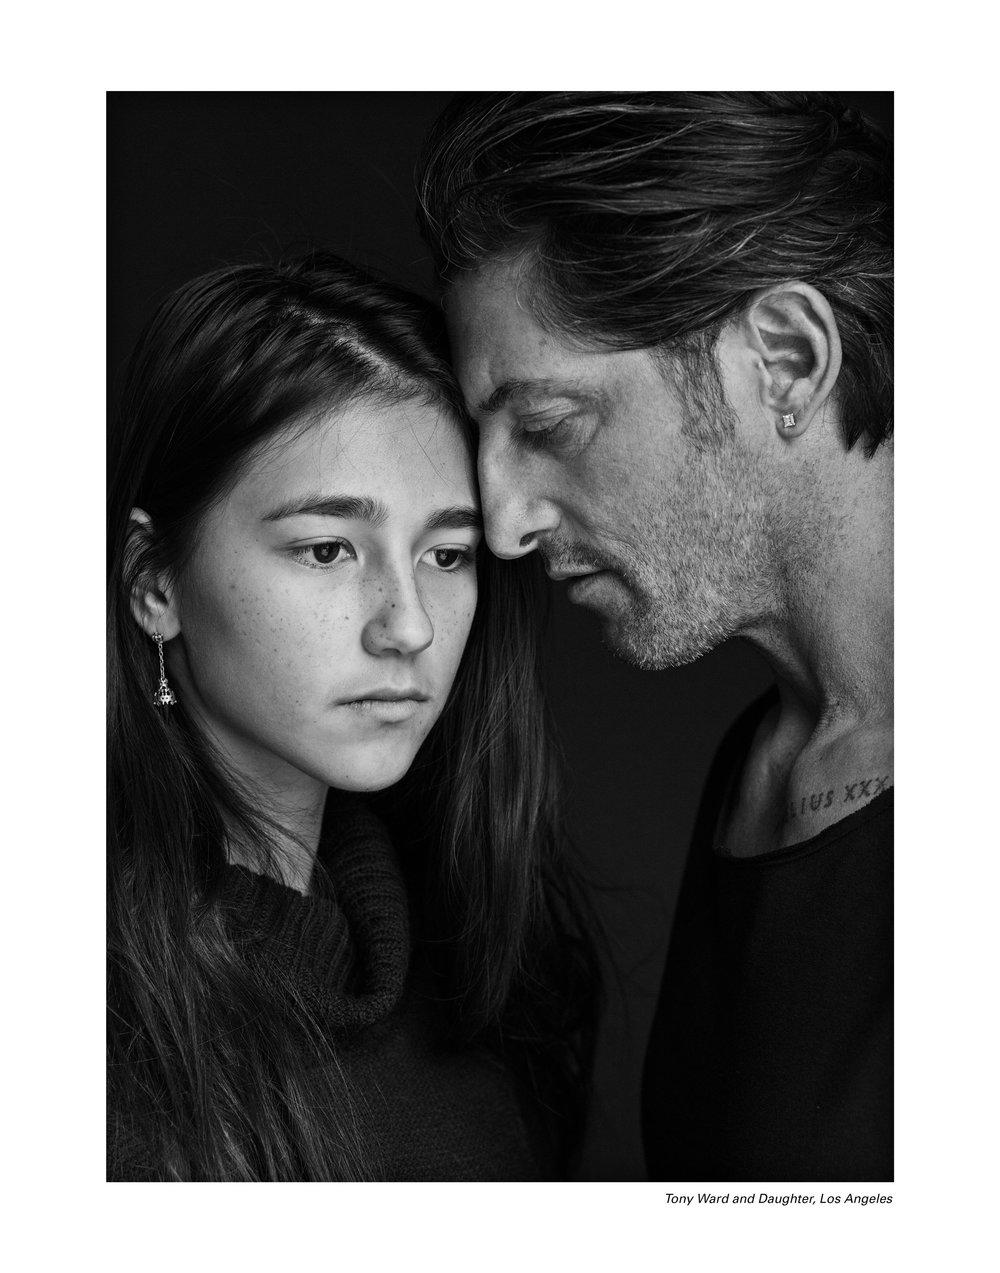 nf_Tony_Ward_and_Daughter_Los_Angeles.jpg